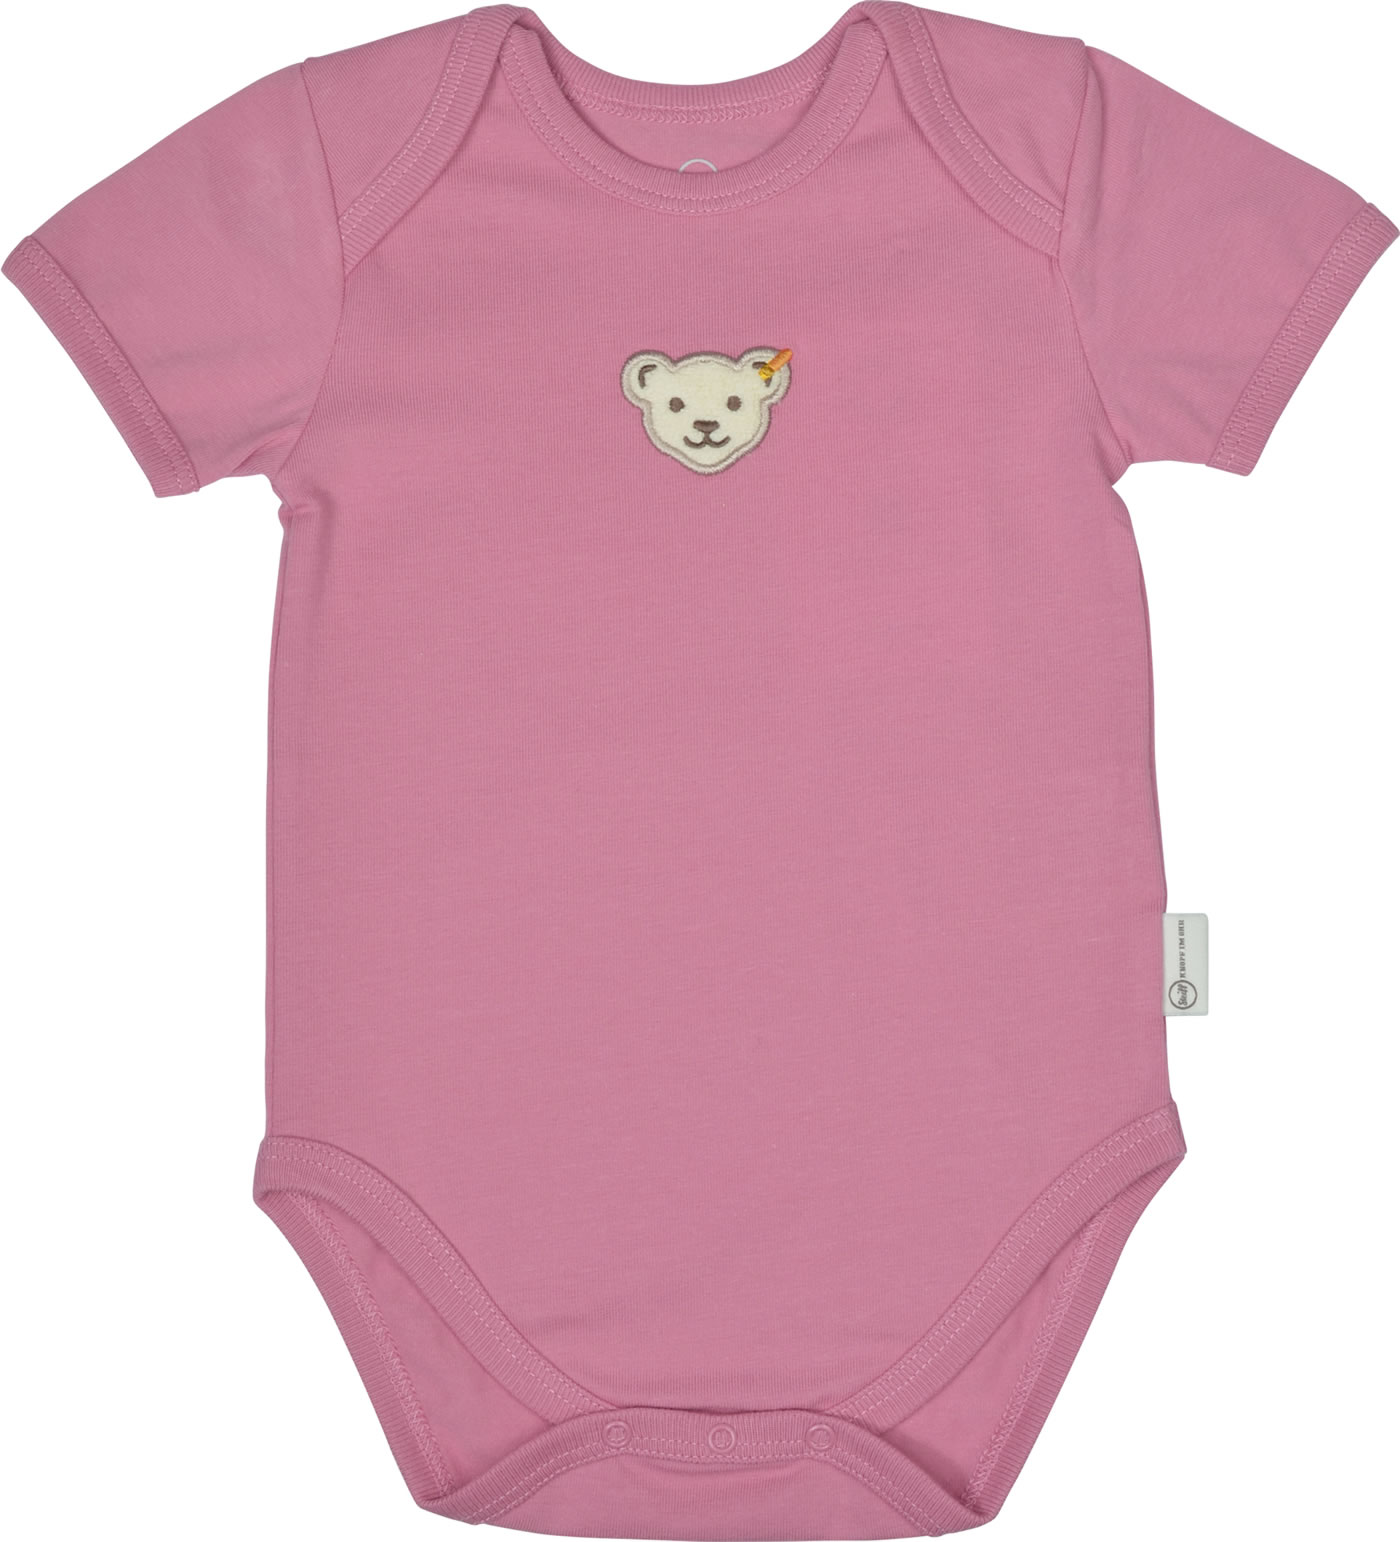 Steiff Unisex Baby Body